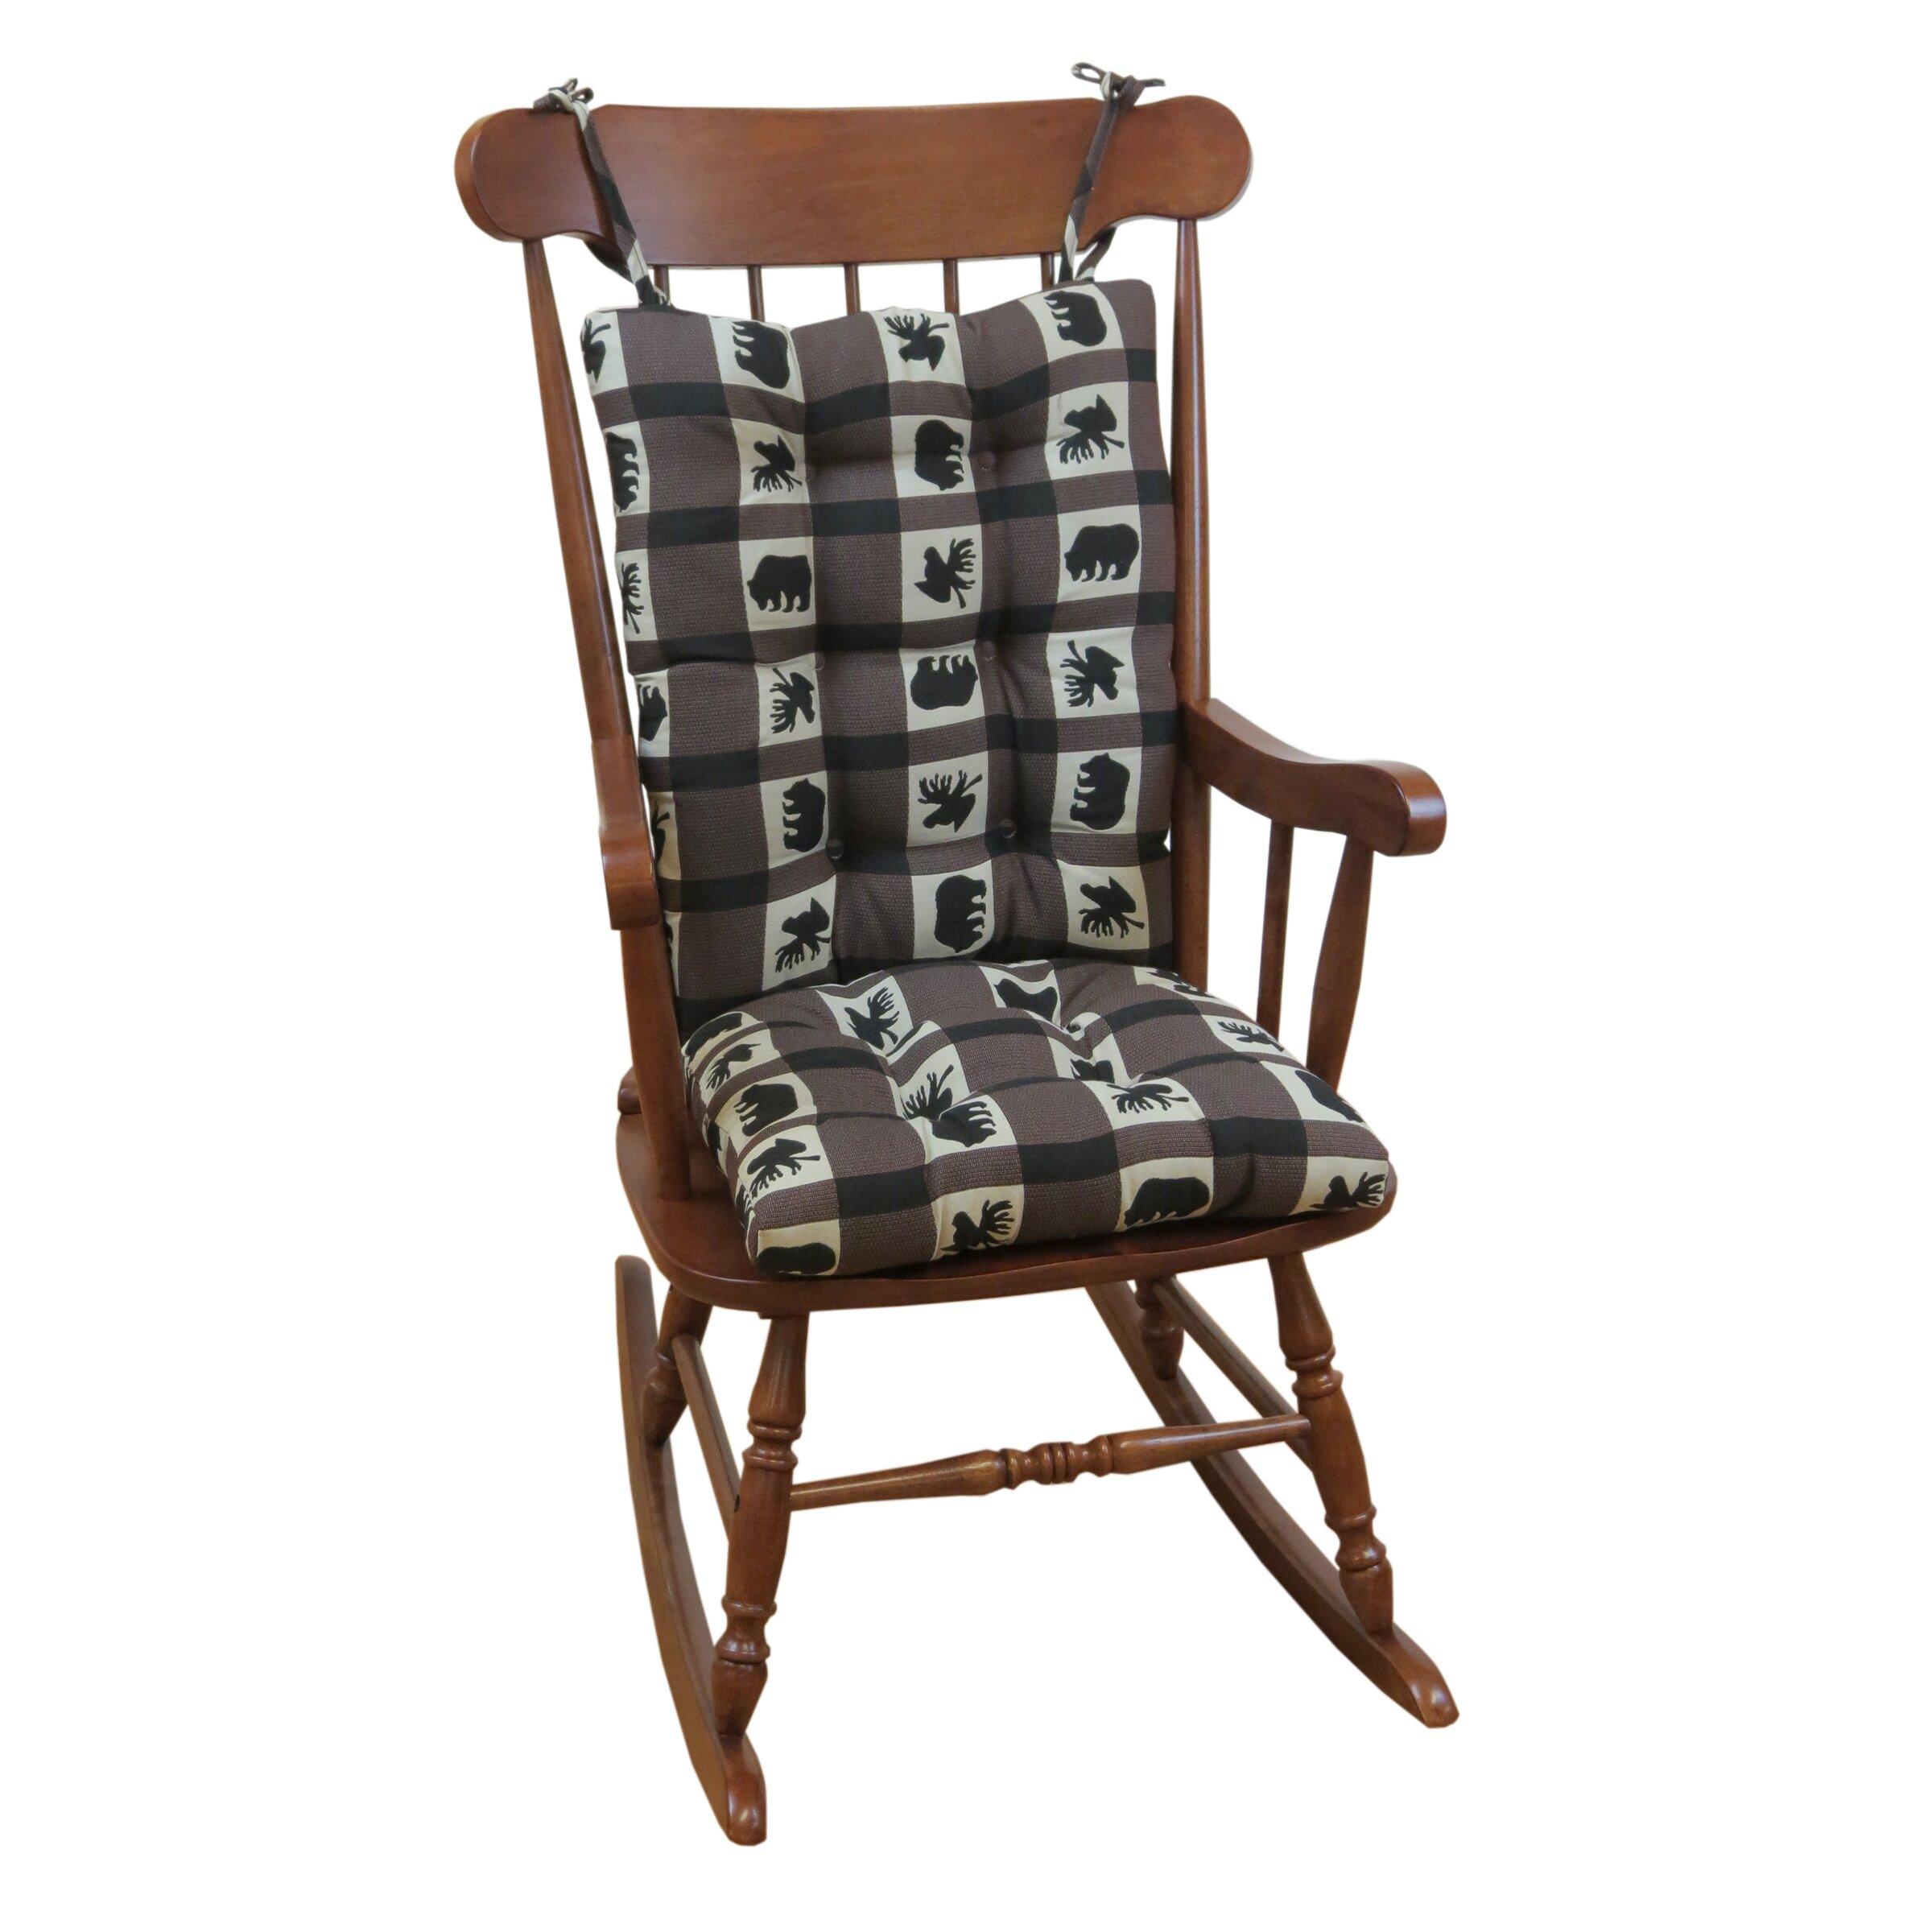 Klear Vu Lodge Animal Plaid Gripper Jumbo Rocking Chair